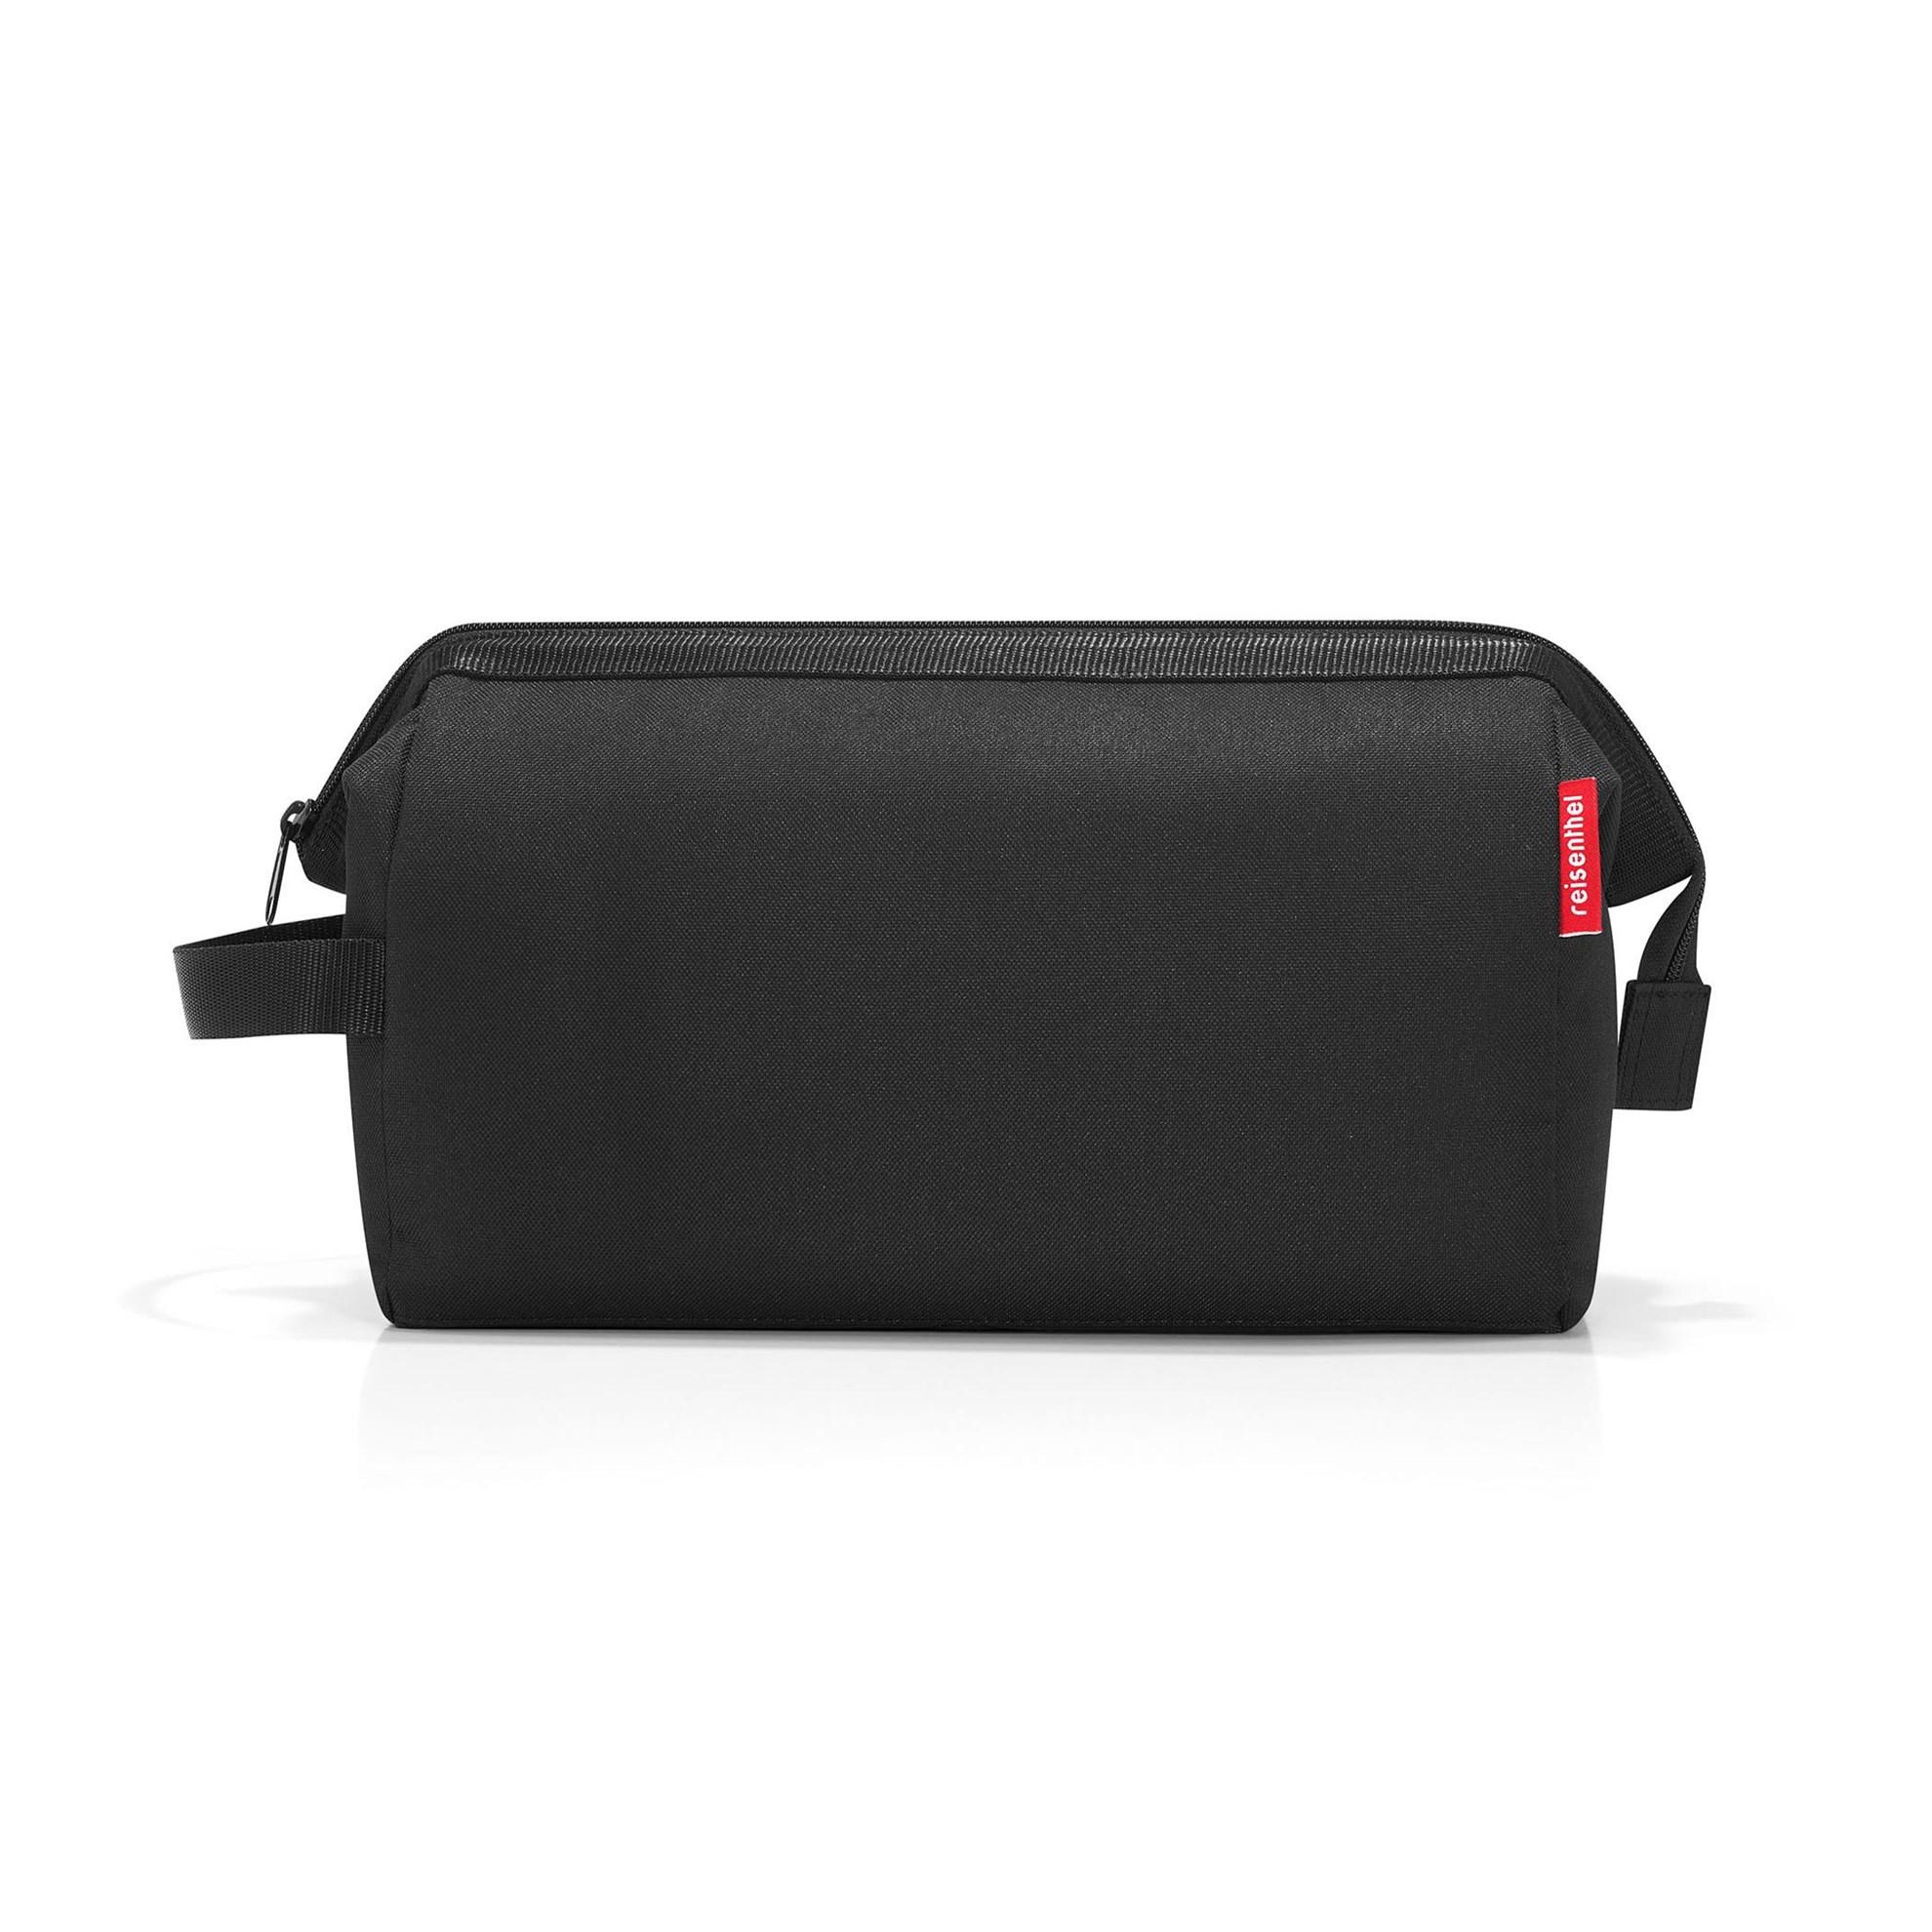 Kosmetická taška TRAVELCOSMETIC XL black_1